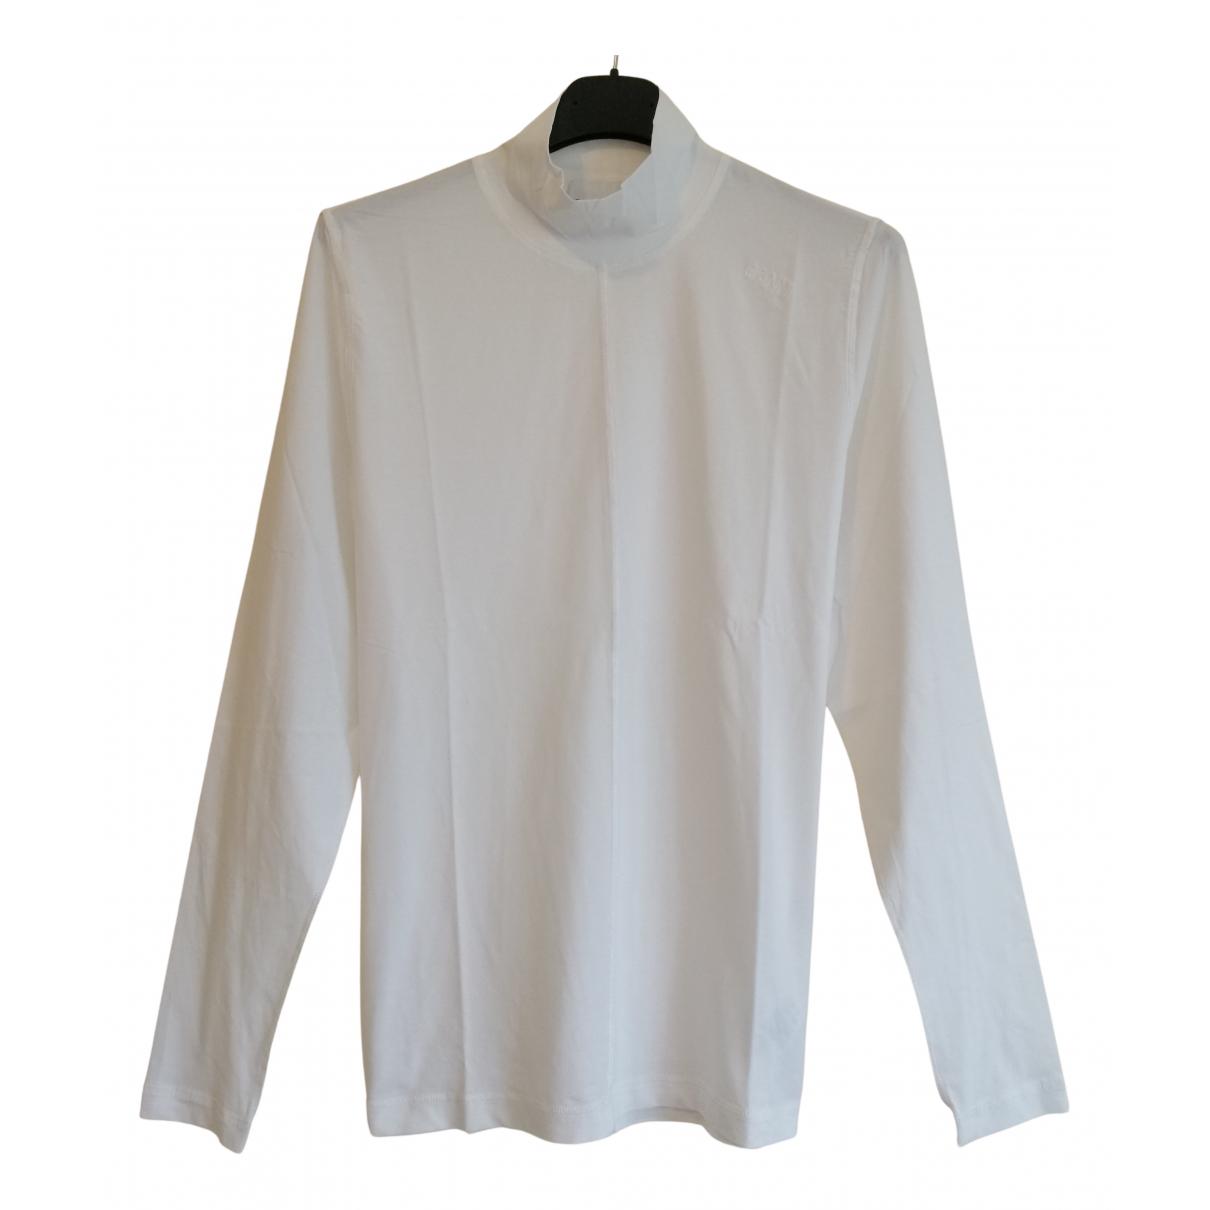 Ganni - Pull Spring Summer 2020 pour femme en coton - blanc